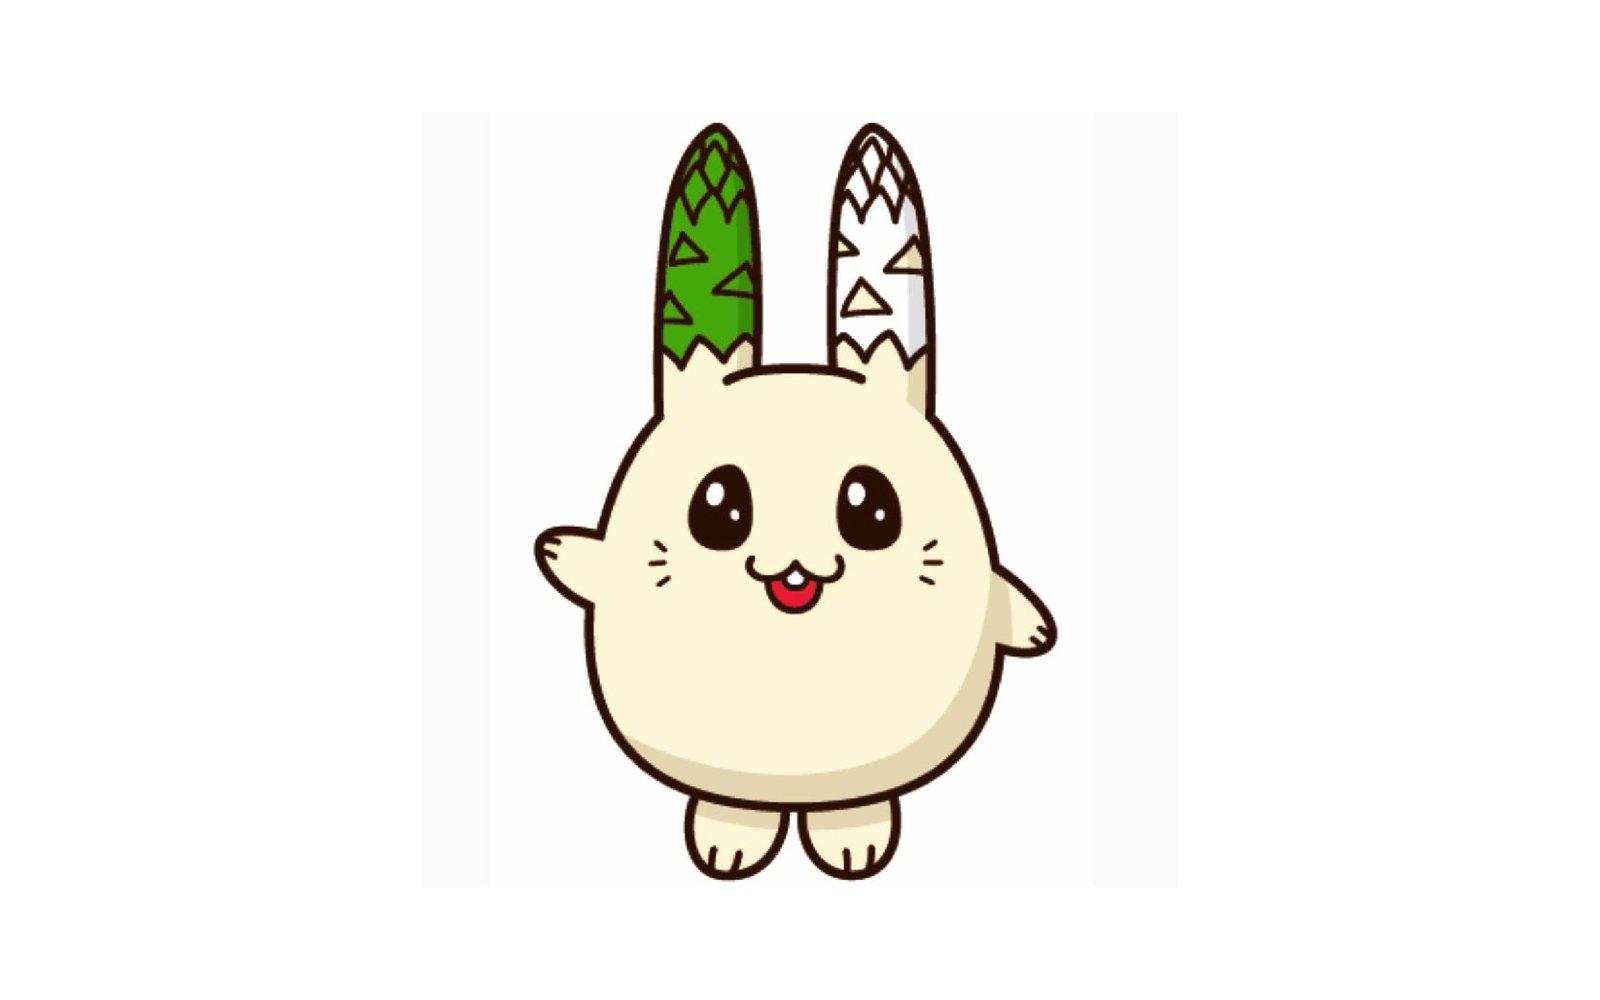 usapara kun is the asparagus bunny rabbit mascot of kimobetsu in hokkaido japan